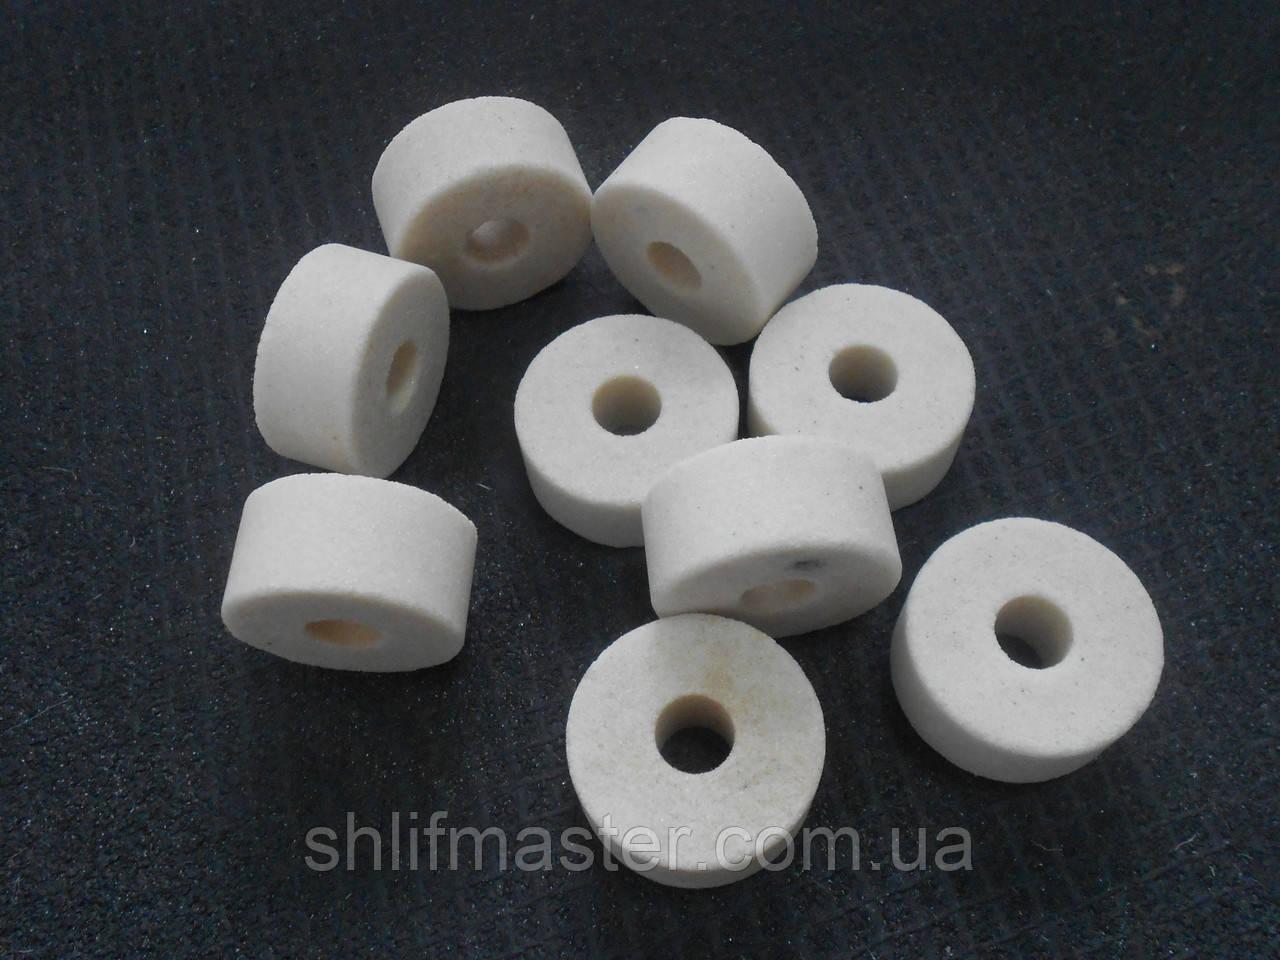 Абразивный круг шлифовальный (электрокорунд белый) 25А ПП 32Х16Х10